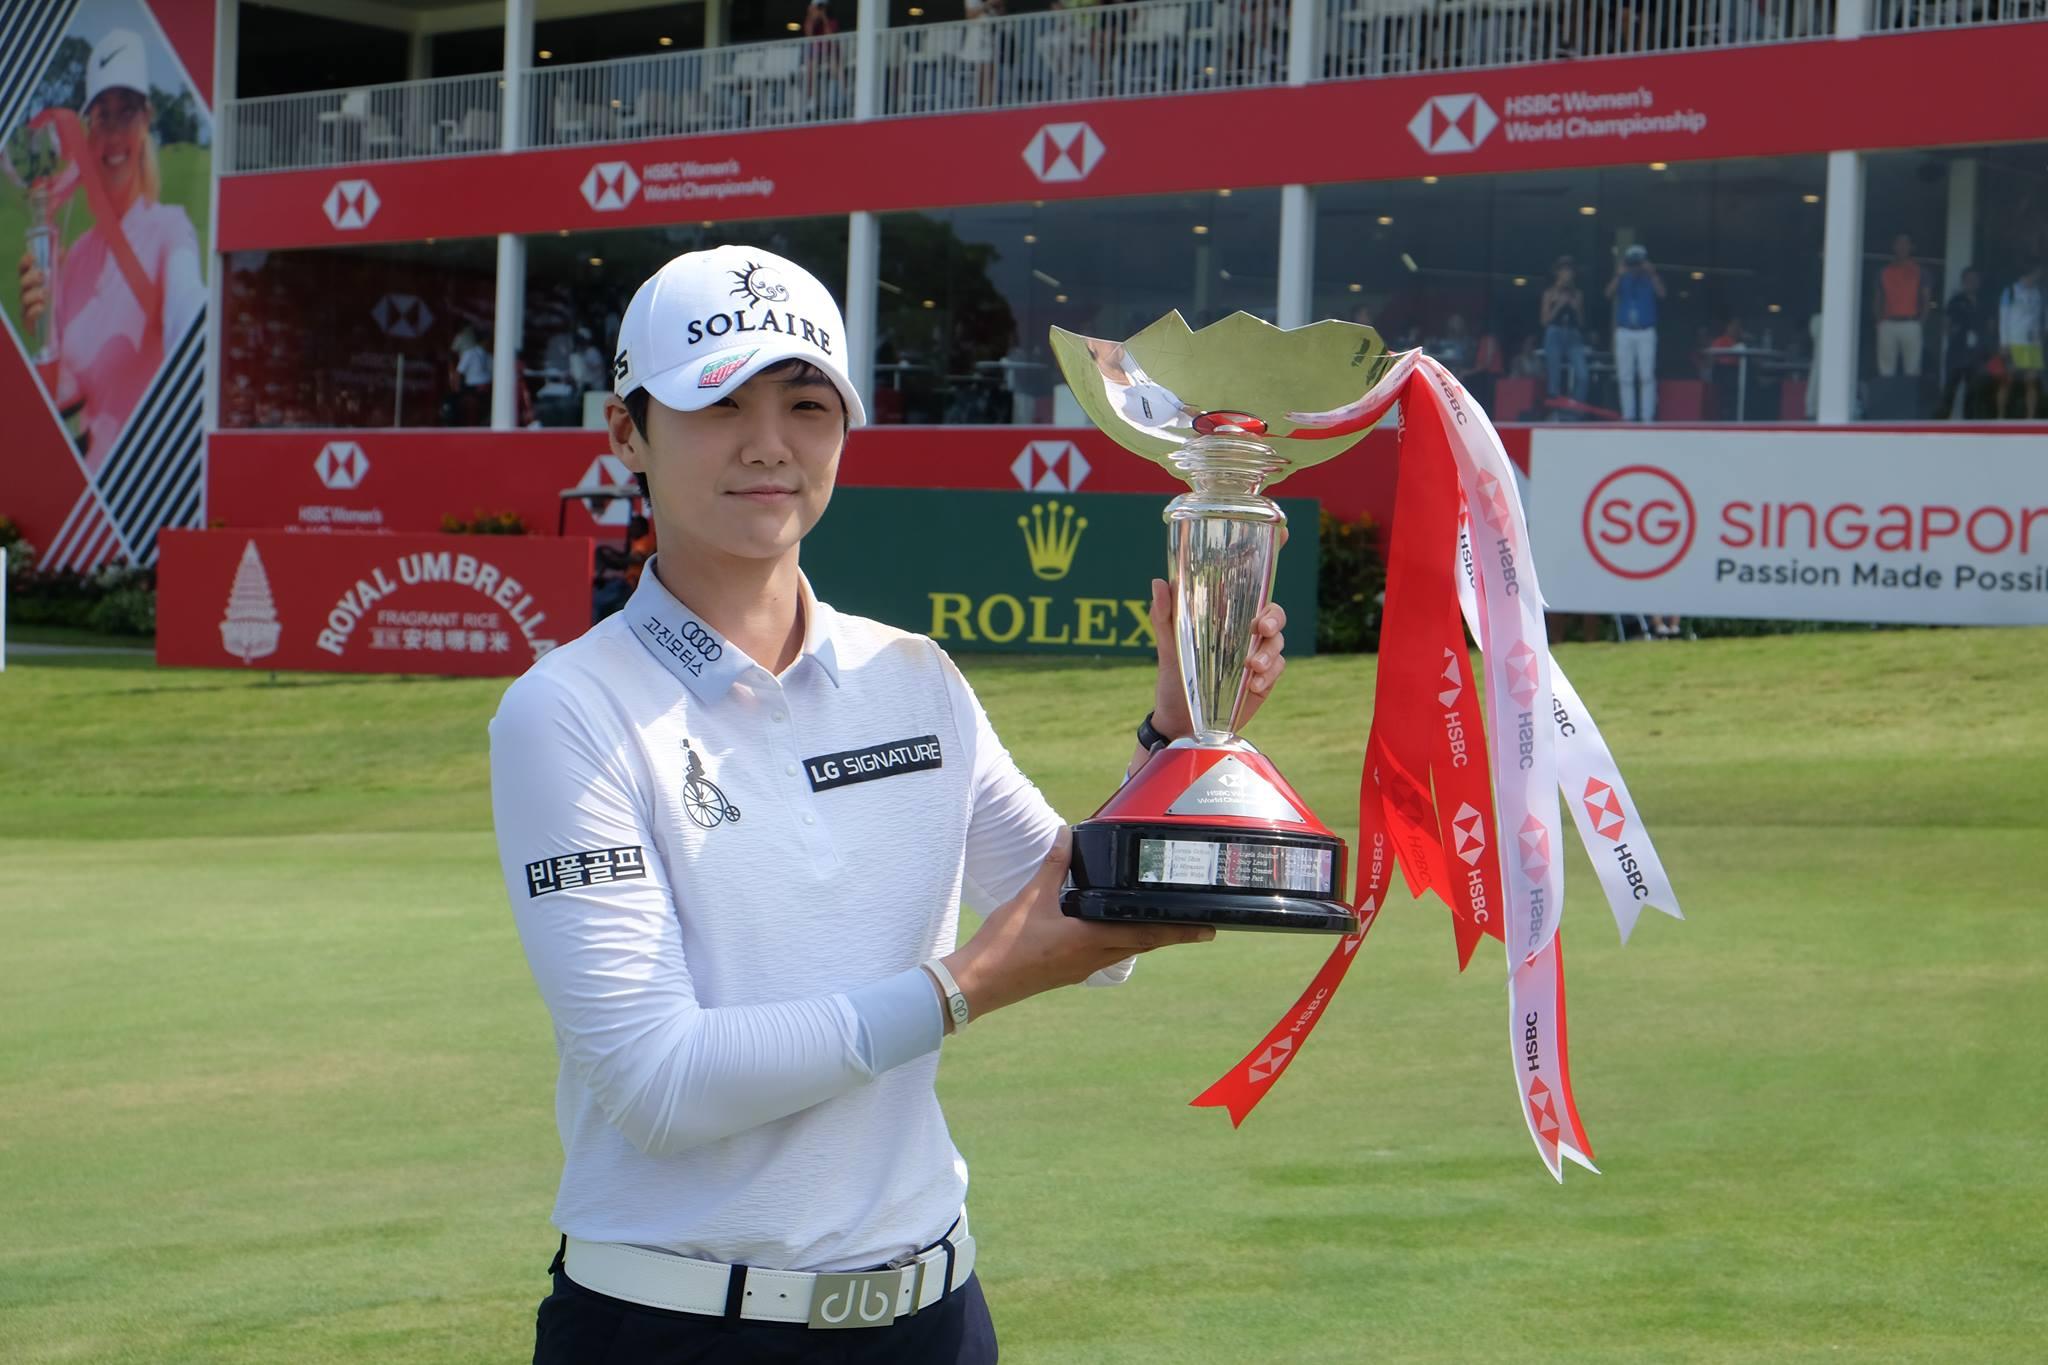 Sung Hyun Park, Winner of HSBC Women's World Championship 2019.